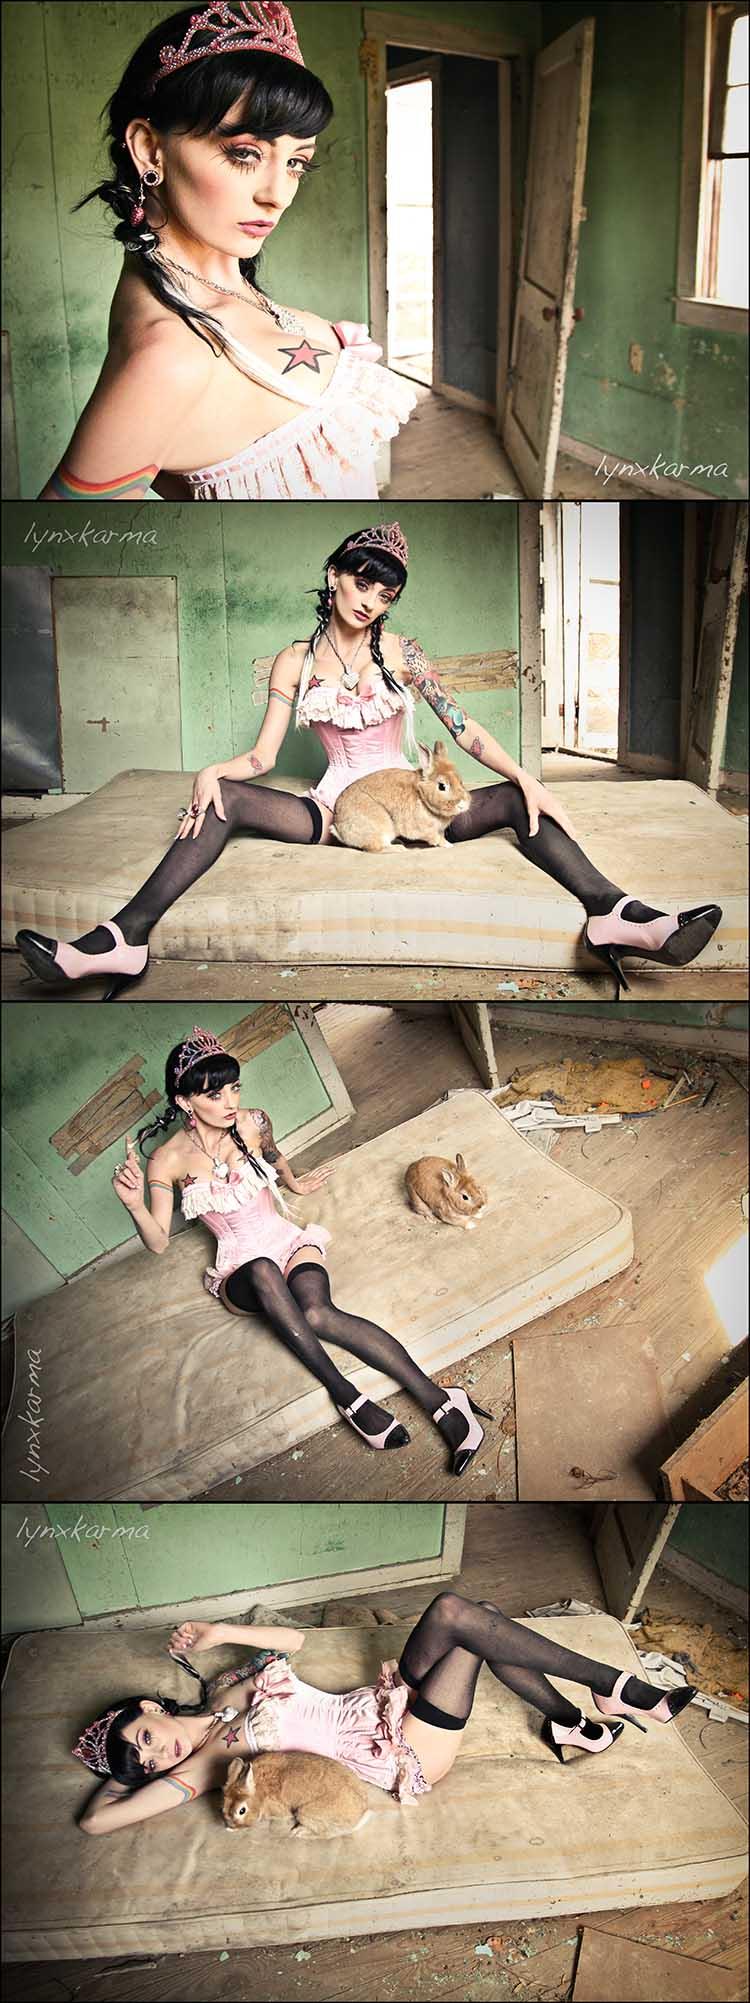 :) Apr 25, 2008 Lynxkarma Photography (Kira Bucca) Zui with the amazing B Rabbit!